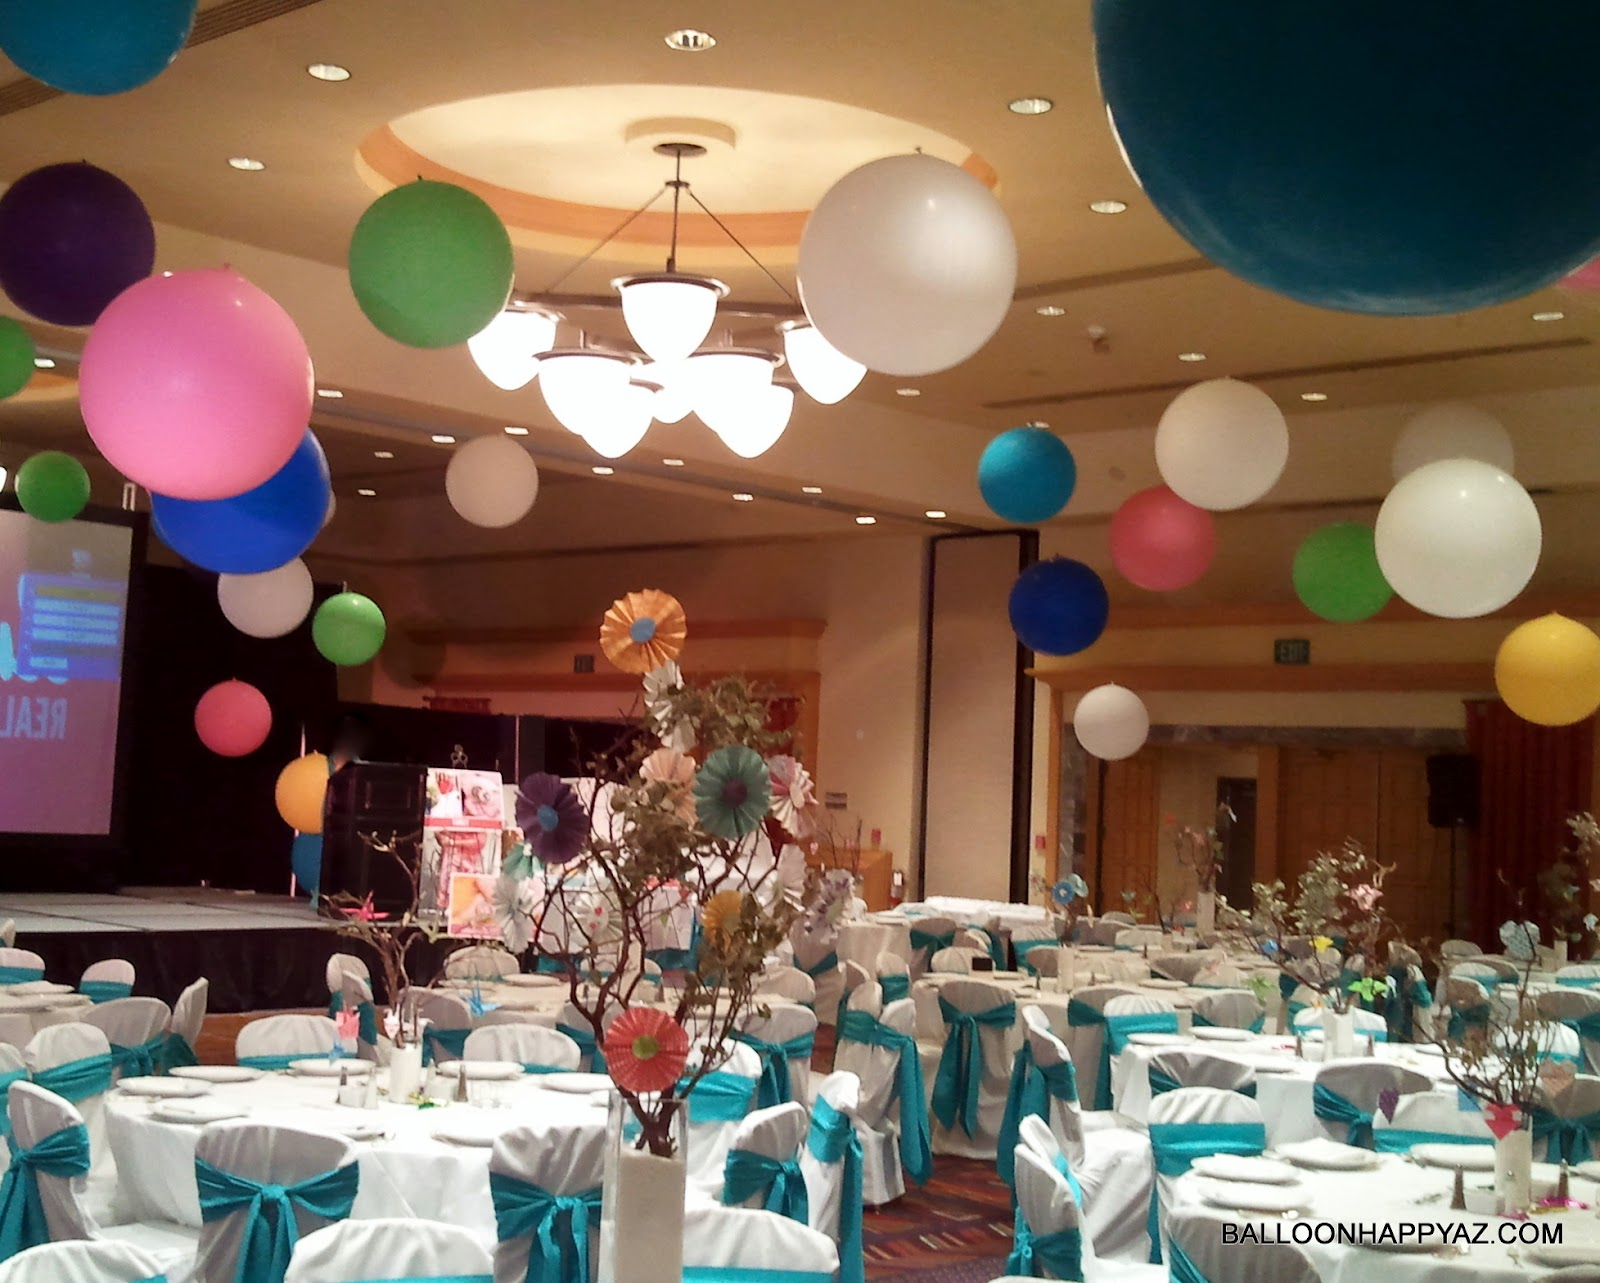 Balloon Happy AZ: July 2012